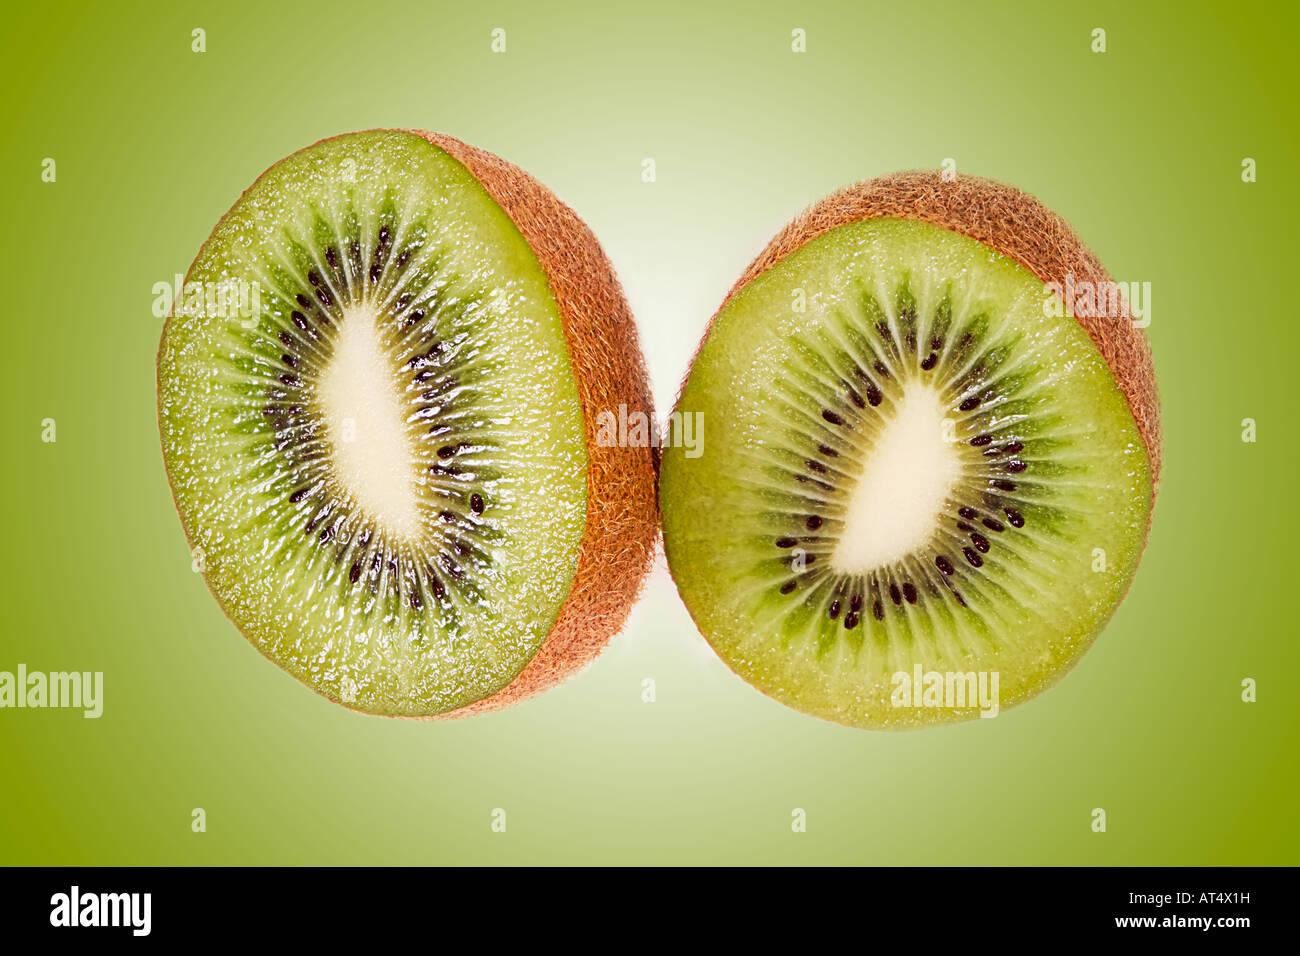 Two kiwi fruit cut on matching green background - Stock Image